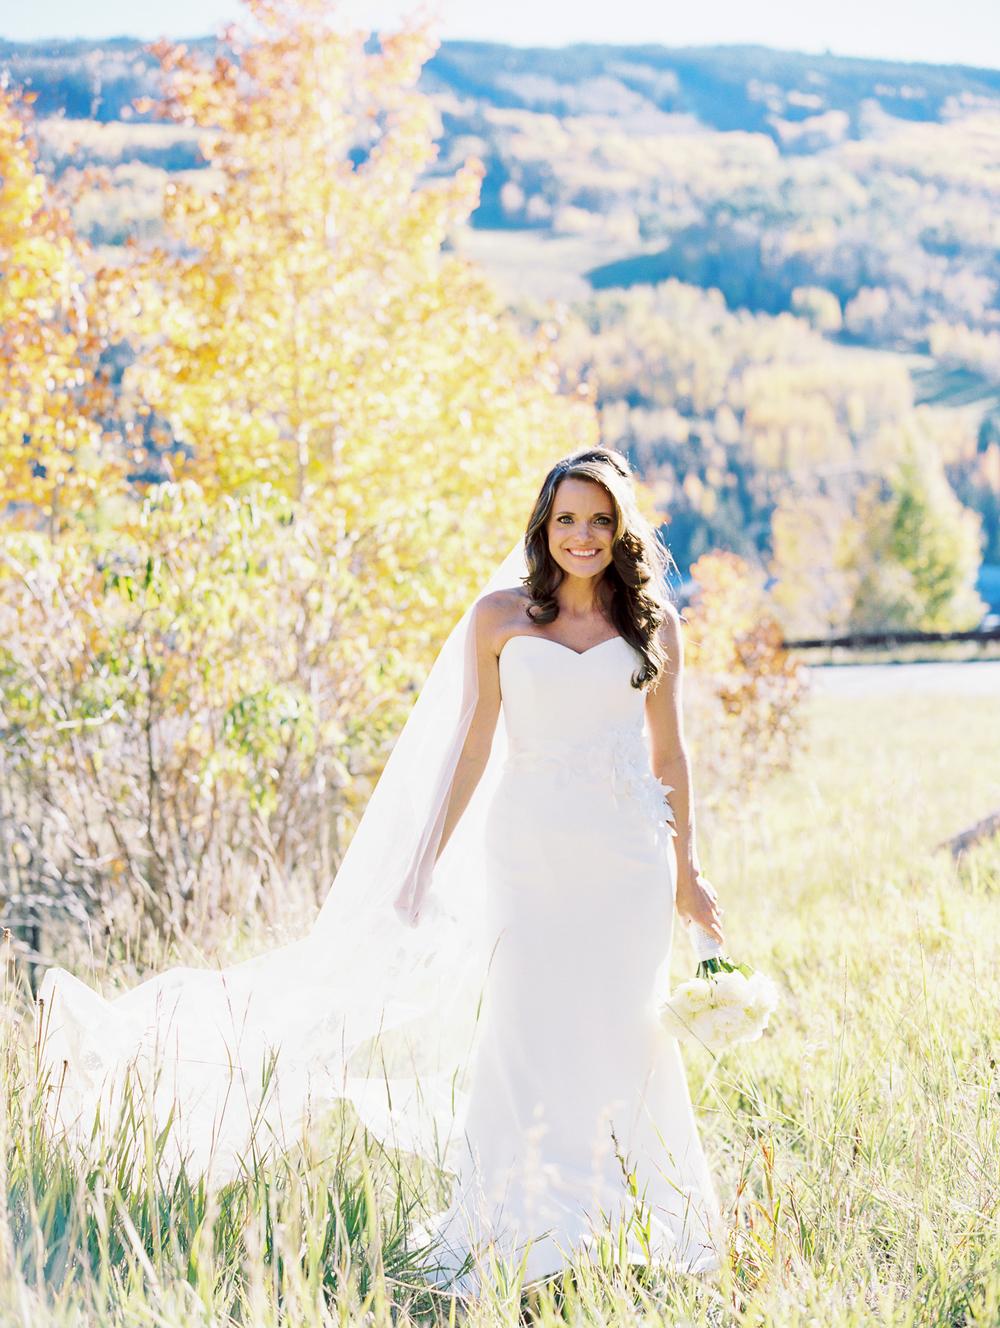 Misty | October 4, 2014 | Four Seasons Vail | Vail, Colorado |  Cassidy Brooke Photography